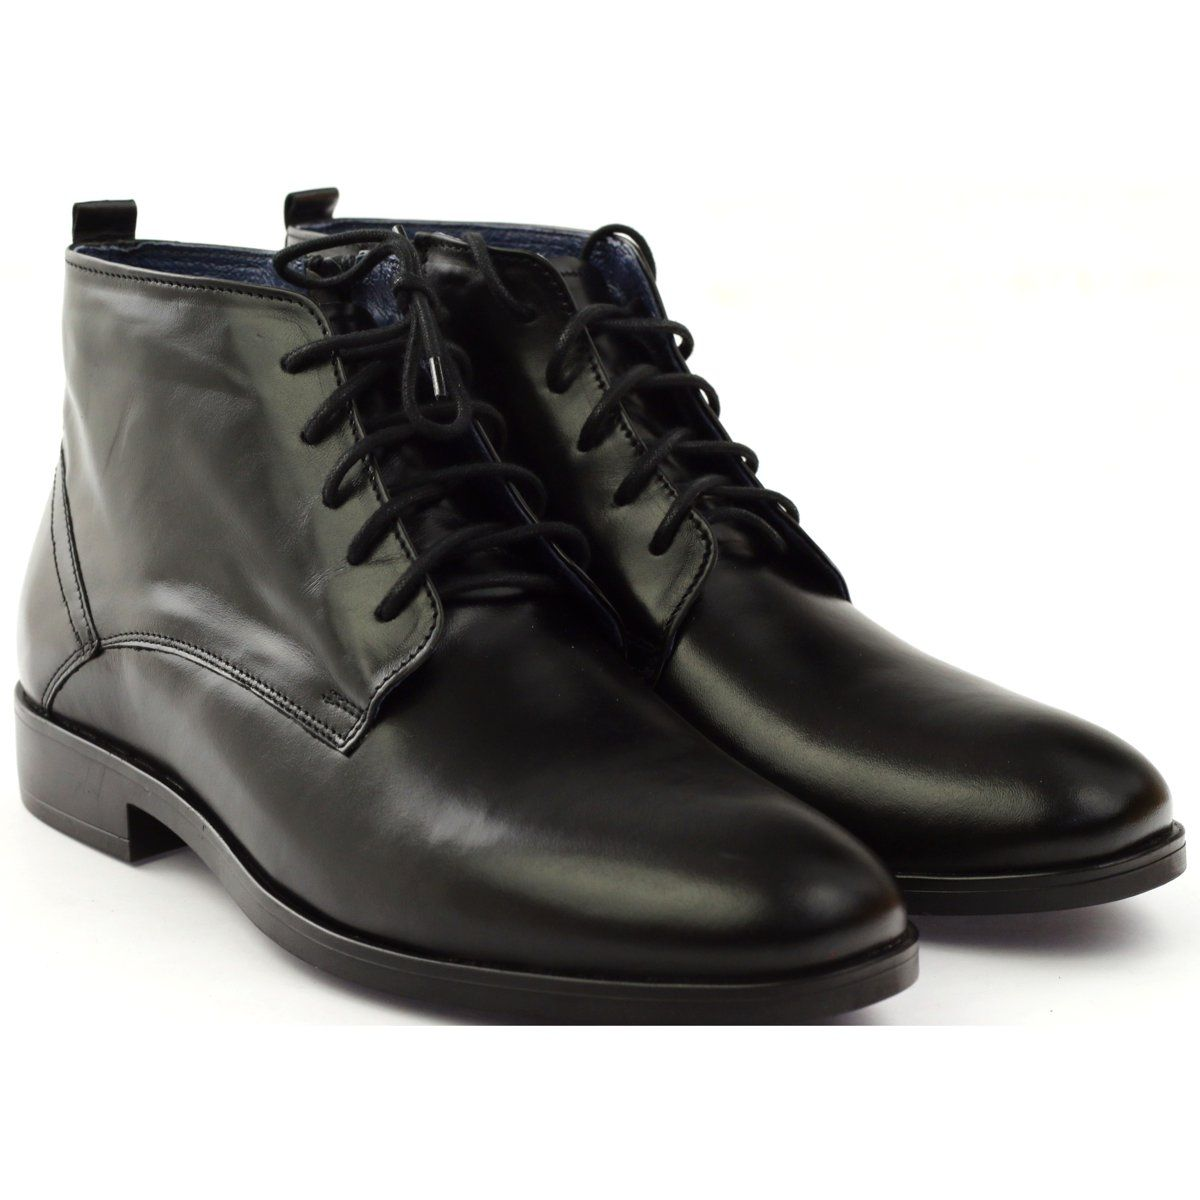 Botki Zimowe Na Suwak Nikopol 663 Czarne Boots Boots Men Winter Boots